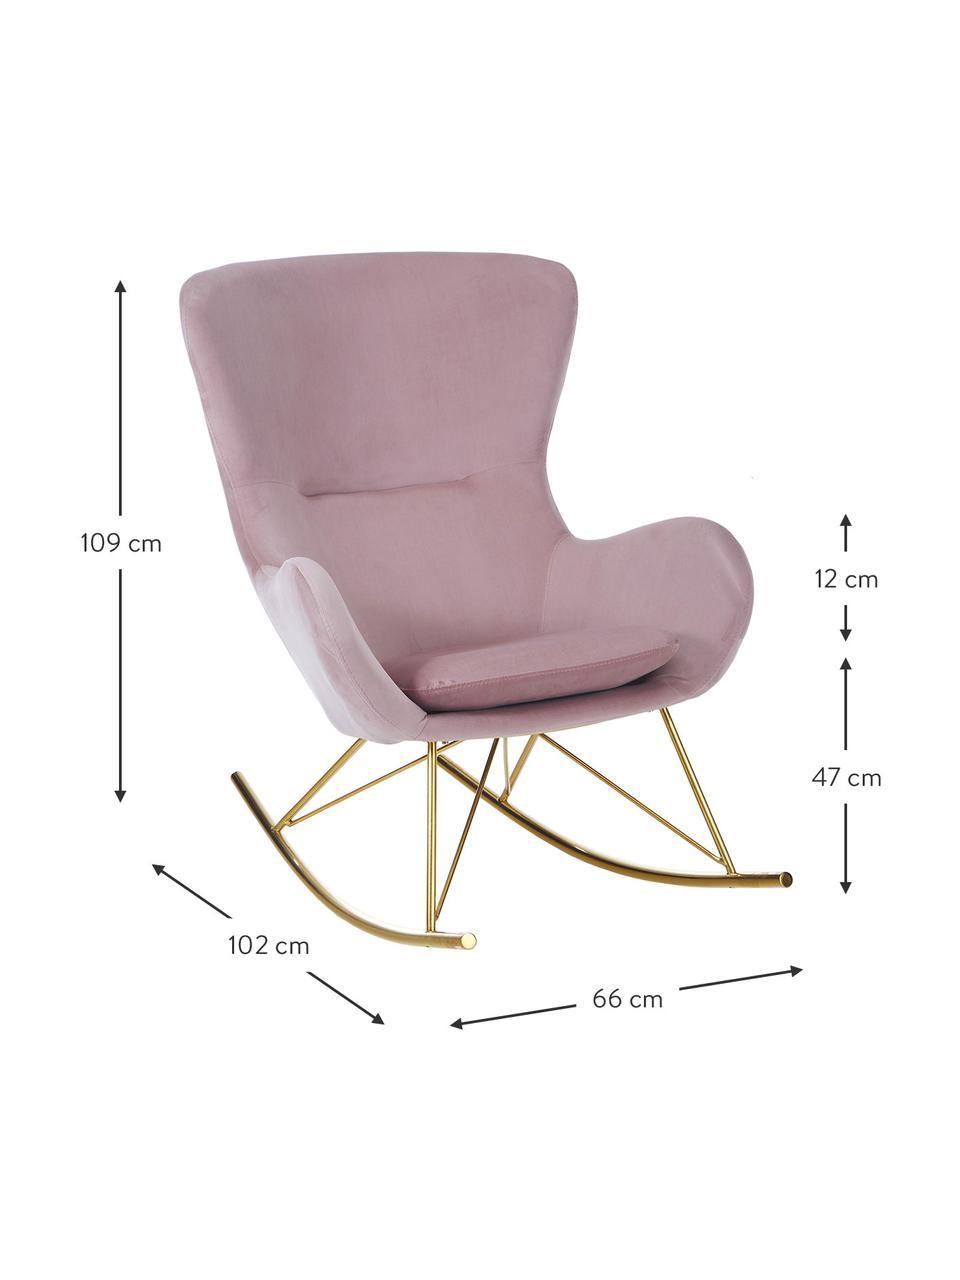 Samt-Schaukelstuhl Wing in Rosa, Bezug: Samt (Polyester) Der Bezu, Gestell: Metall, galvanisiert, Samt Rosa, Goldfarben, B 66 x T 102 cm